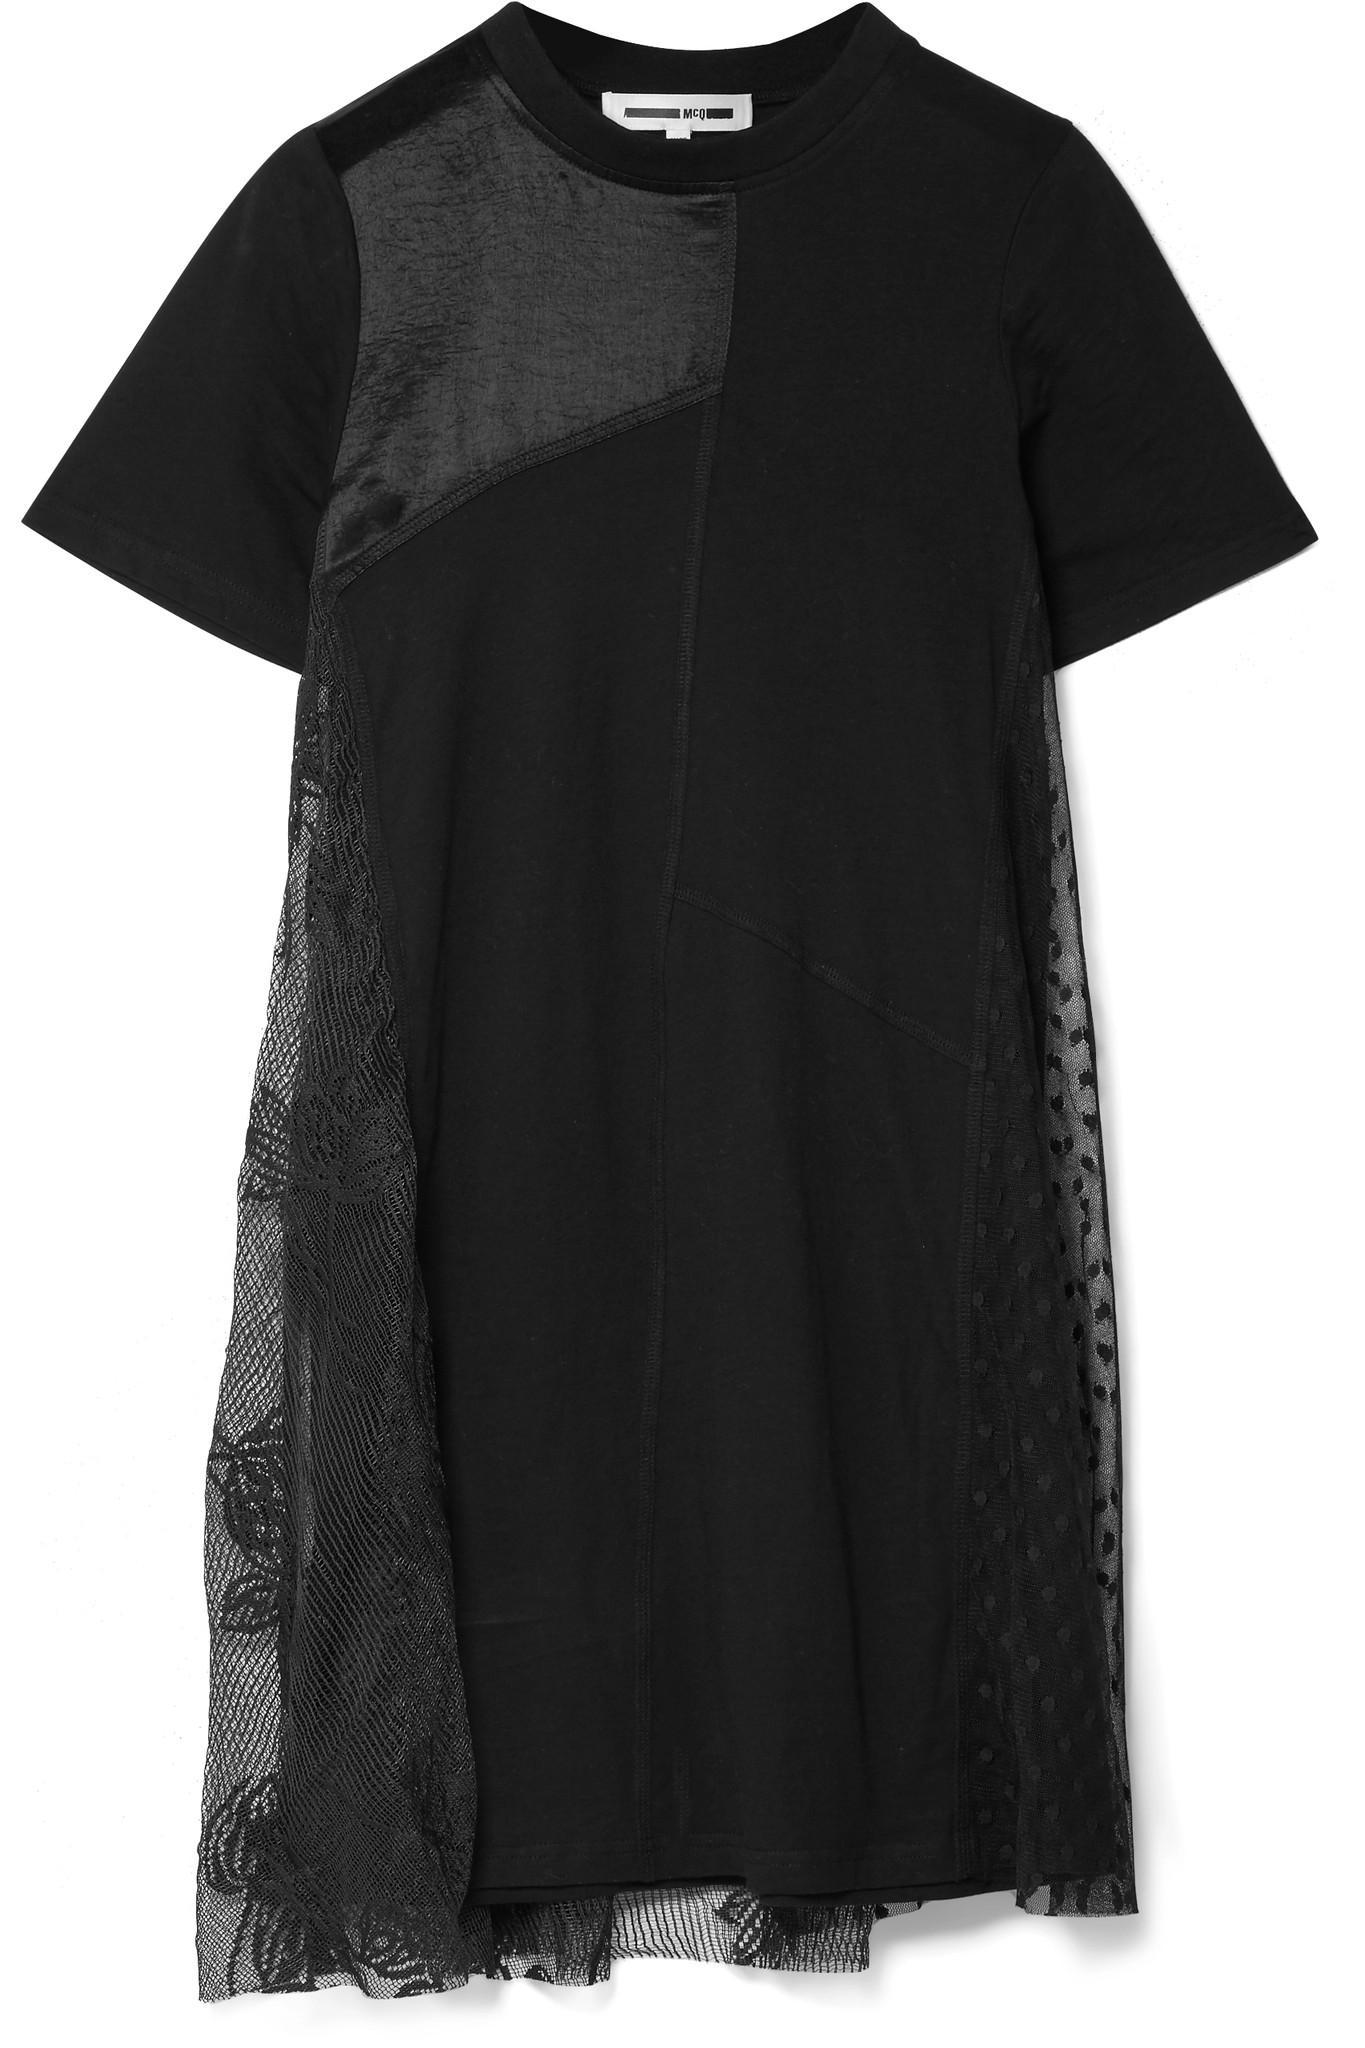 Lace-paneled Jersey Mini Dress - Black Alexander McQueen 1Fwduy